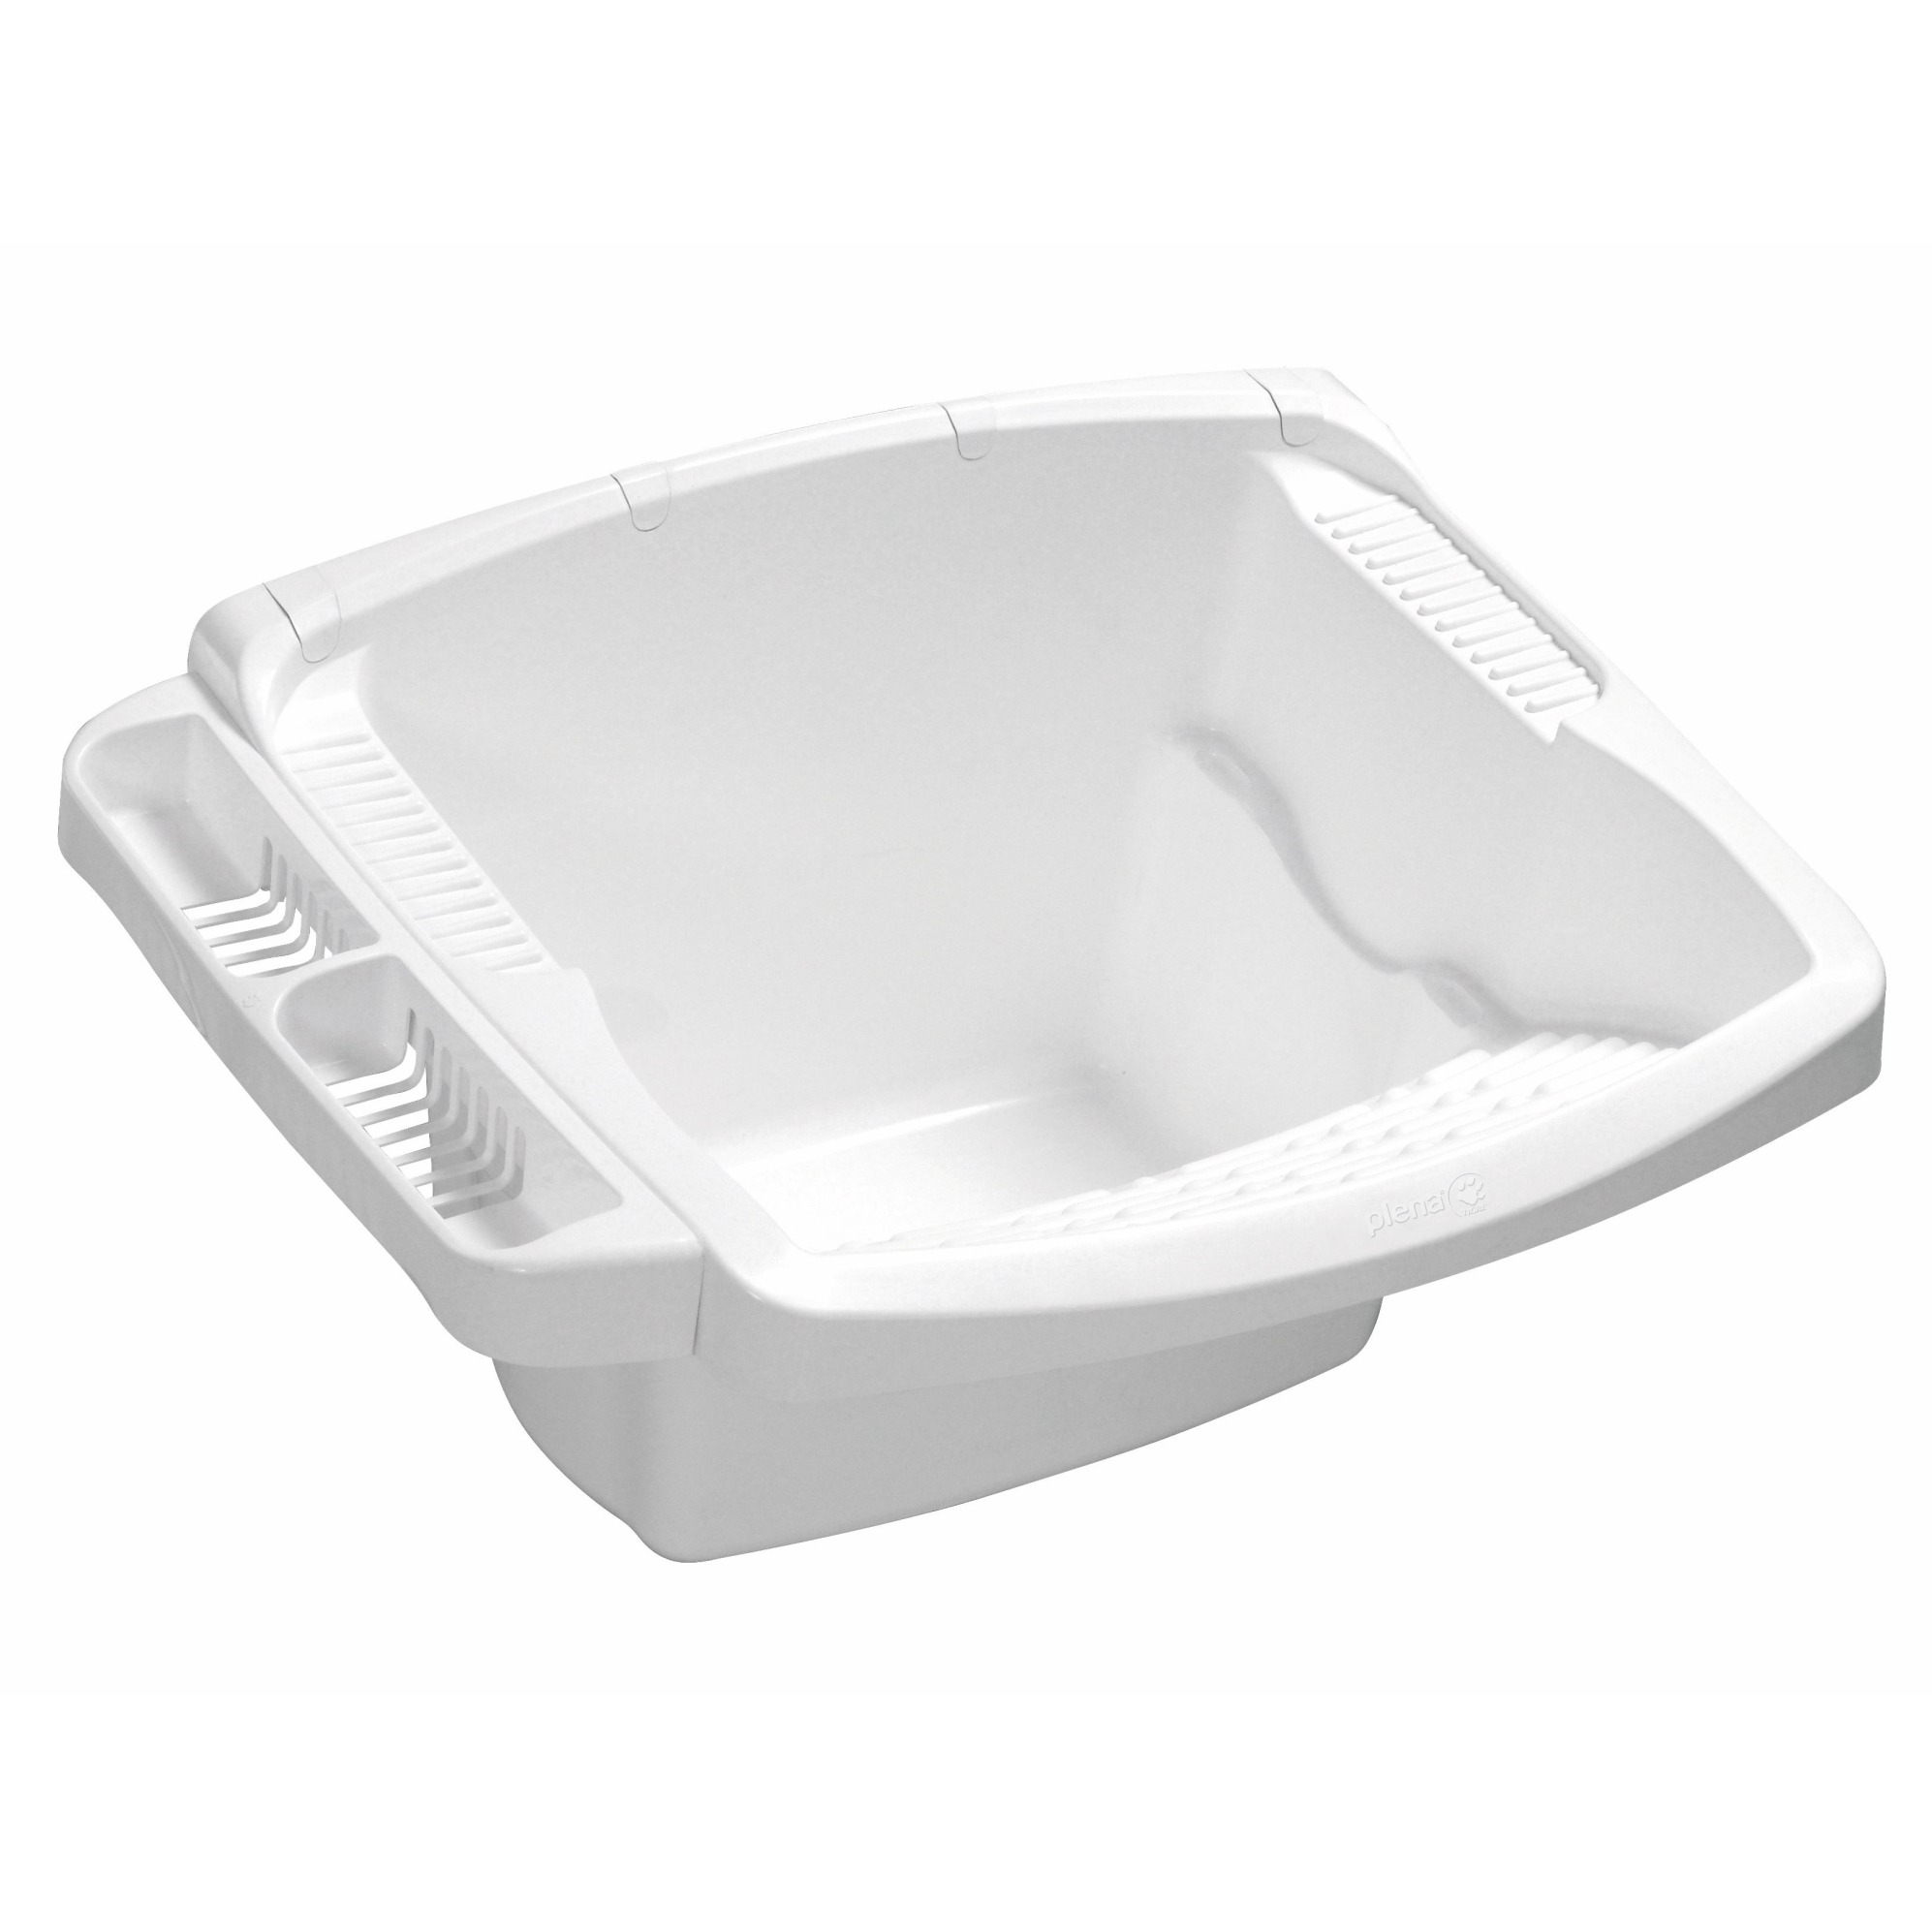 Tanque de Plastico para Lavar Roupas 240 L Branco - Tigre